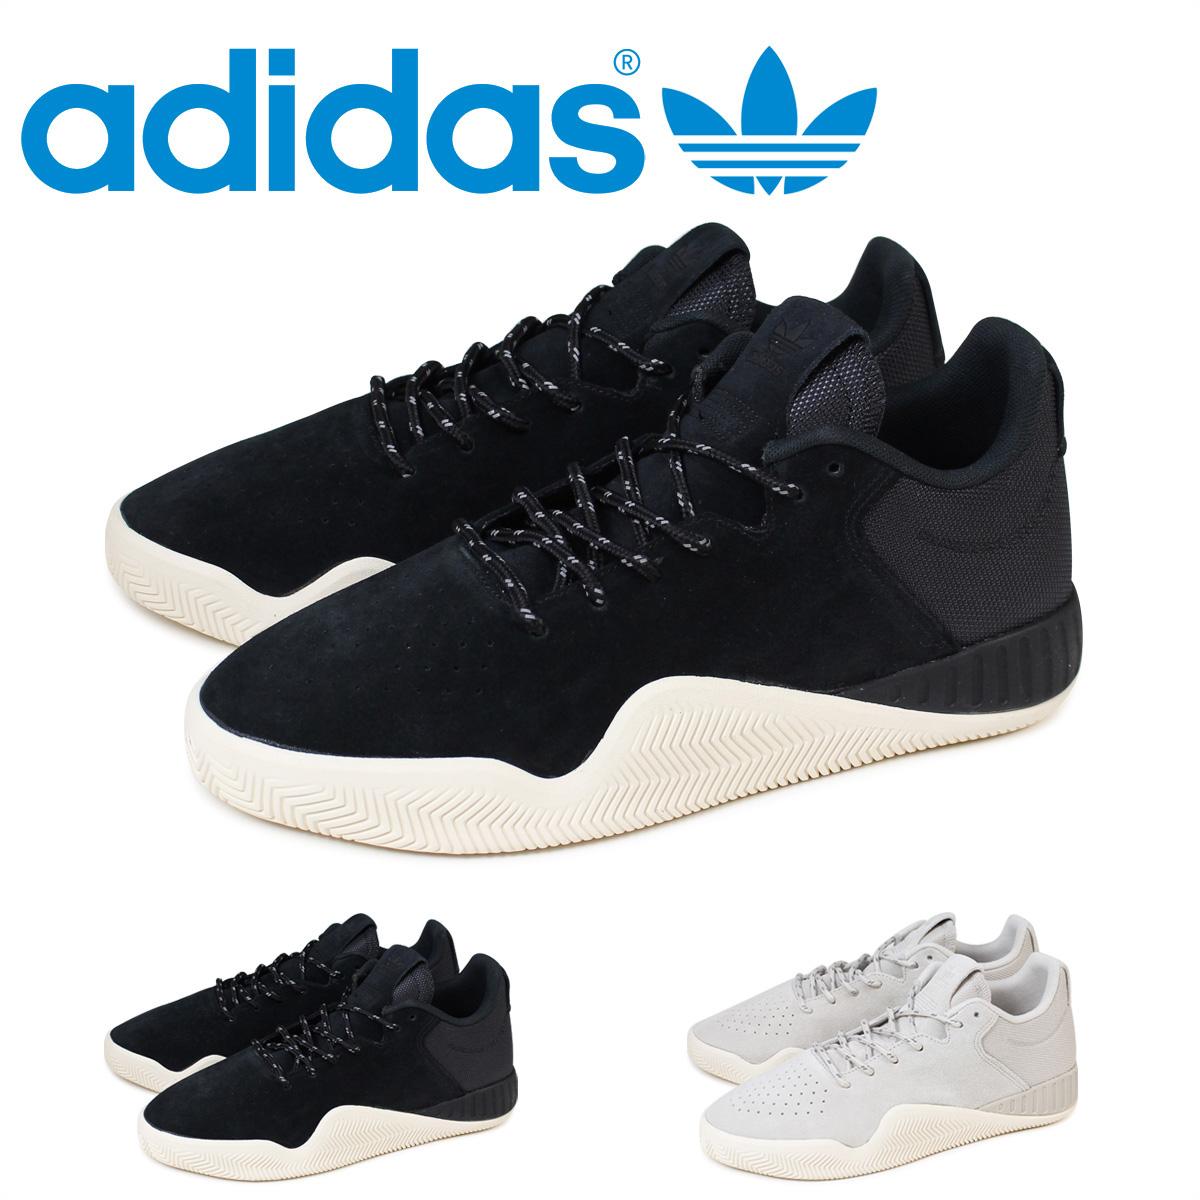 adidas チュブラー アディダス Originals メンズ スニーカー TUBULAR BB8418 BB8419 靴 ホワイト 白 ブラック 黒